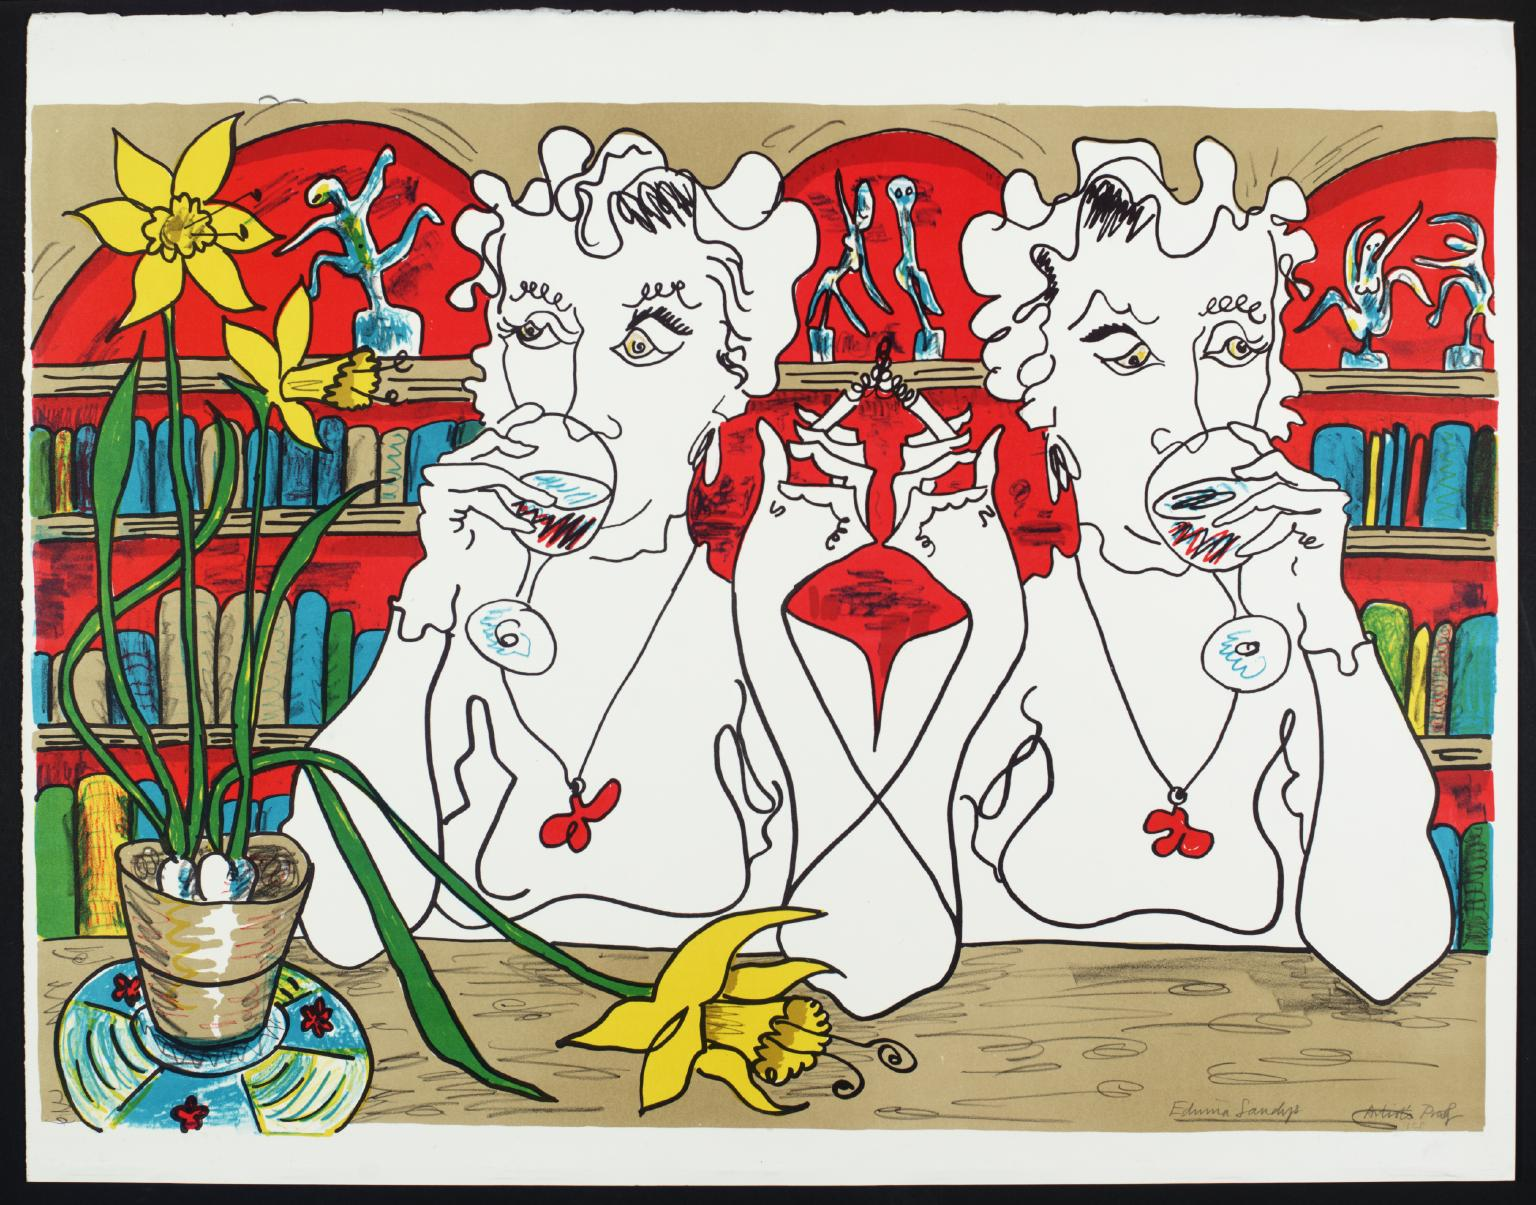 ' Double Vision '1974 by Edwina Sandys